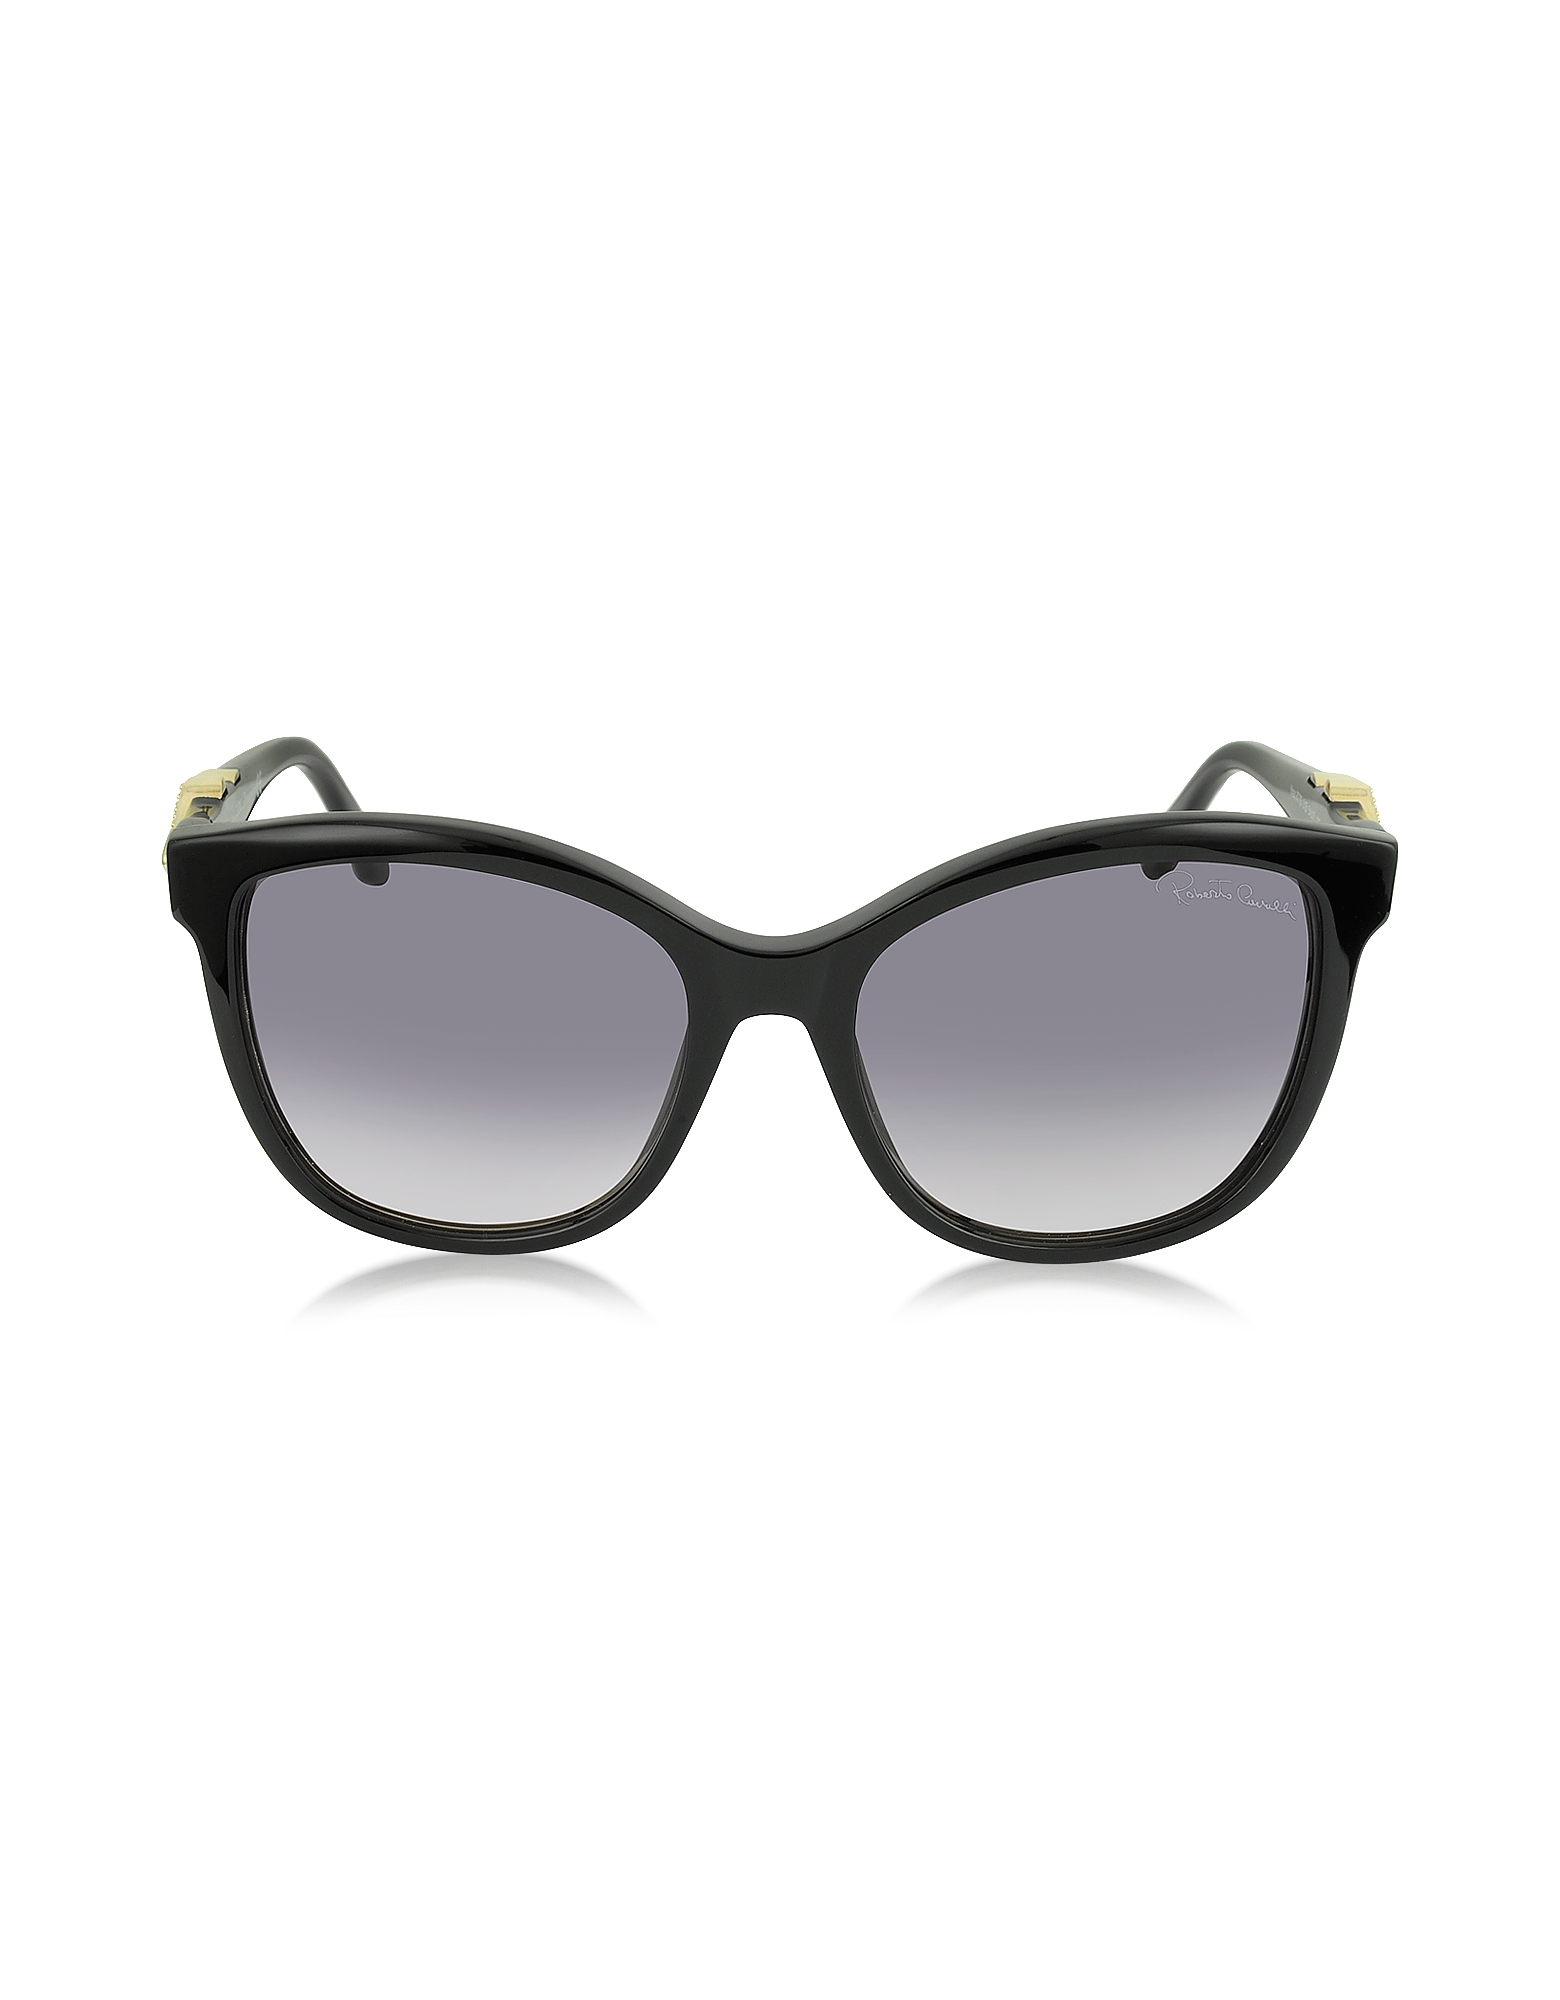 Roberto Cavalli Designer Sunglasses, Kraz 877S 01B Black Acetate Cat Eye Sunglasses w/Goldtone Details